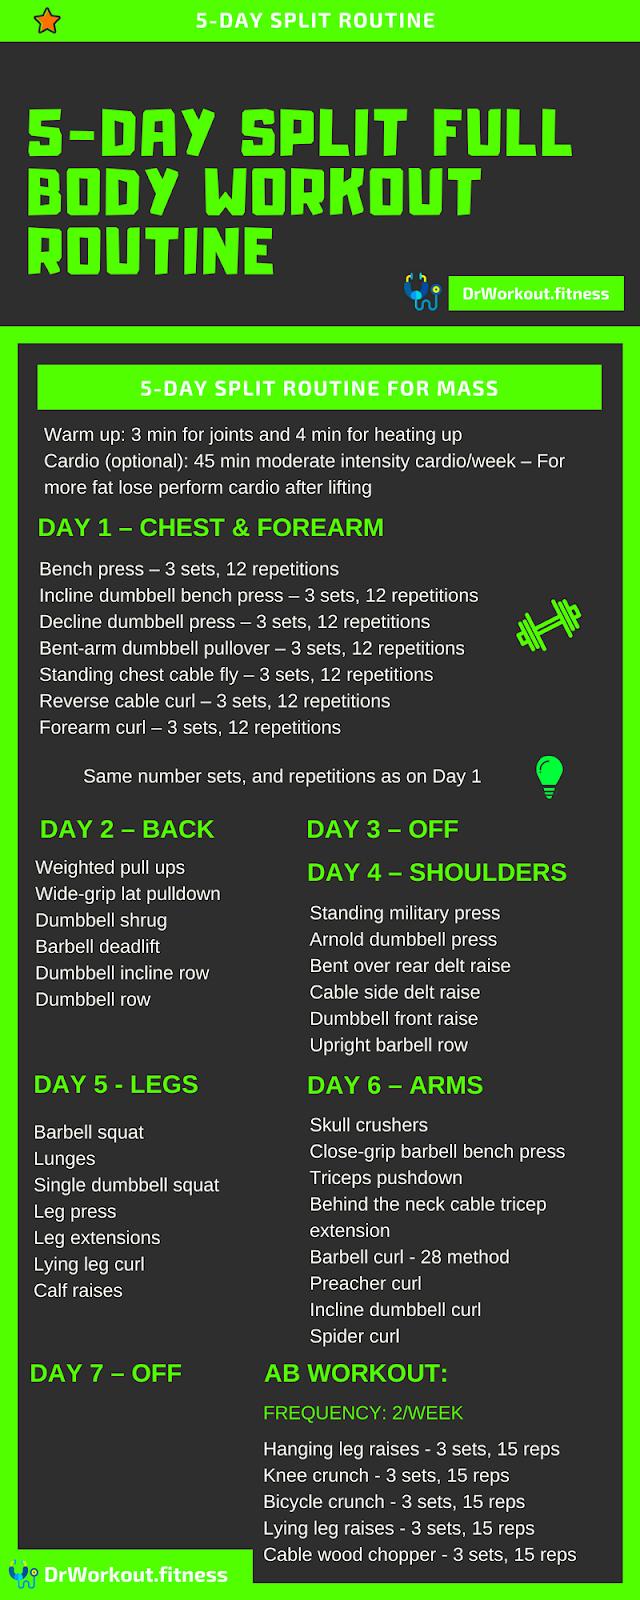 Photo of 5 Day Split Full Body Workout Routine | 5 Day Workout Plan #gym #bodybuilding #w…